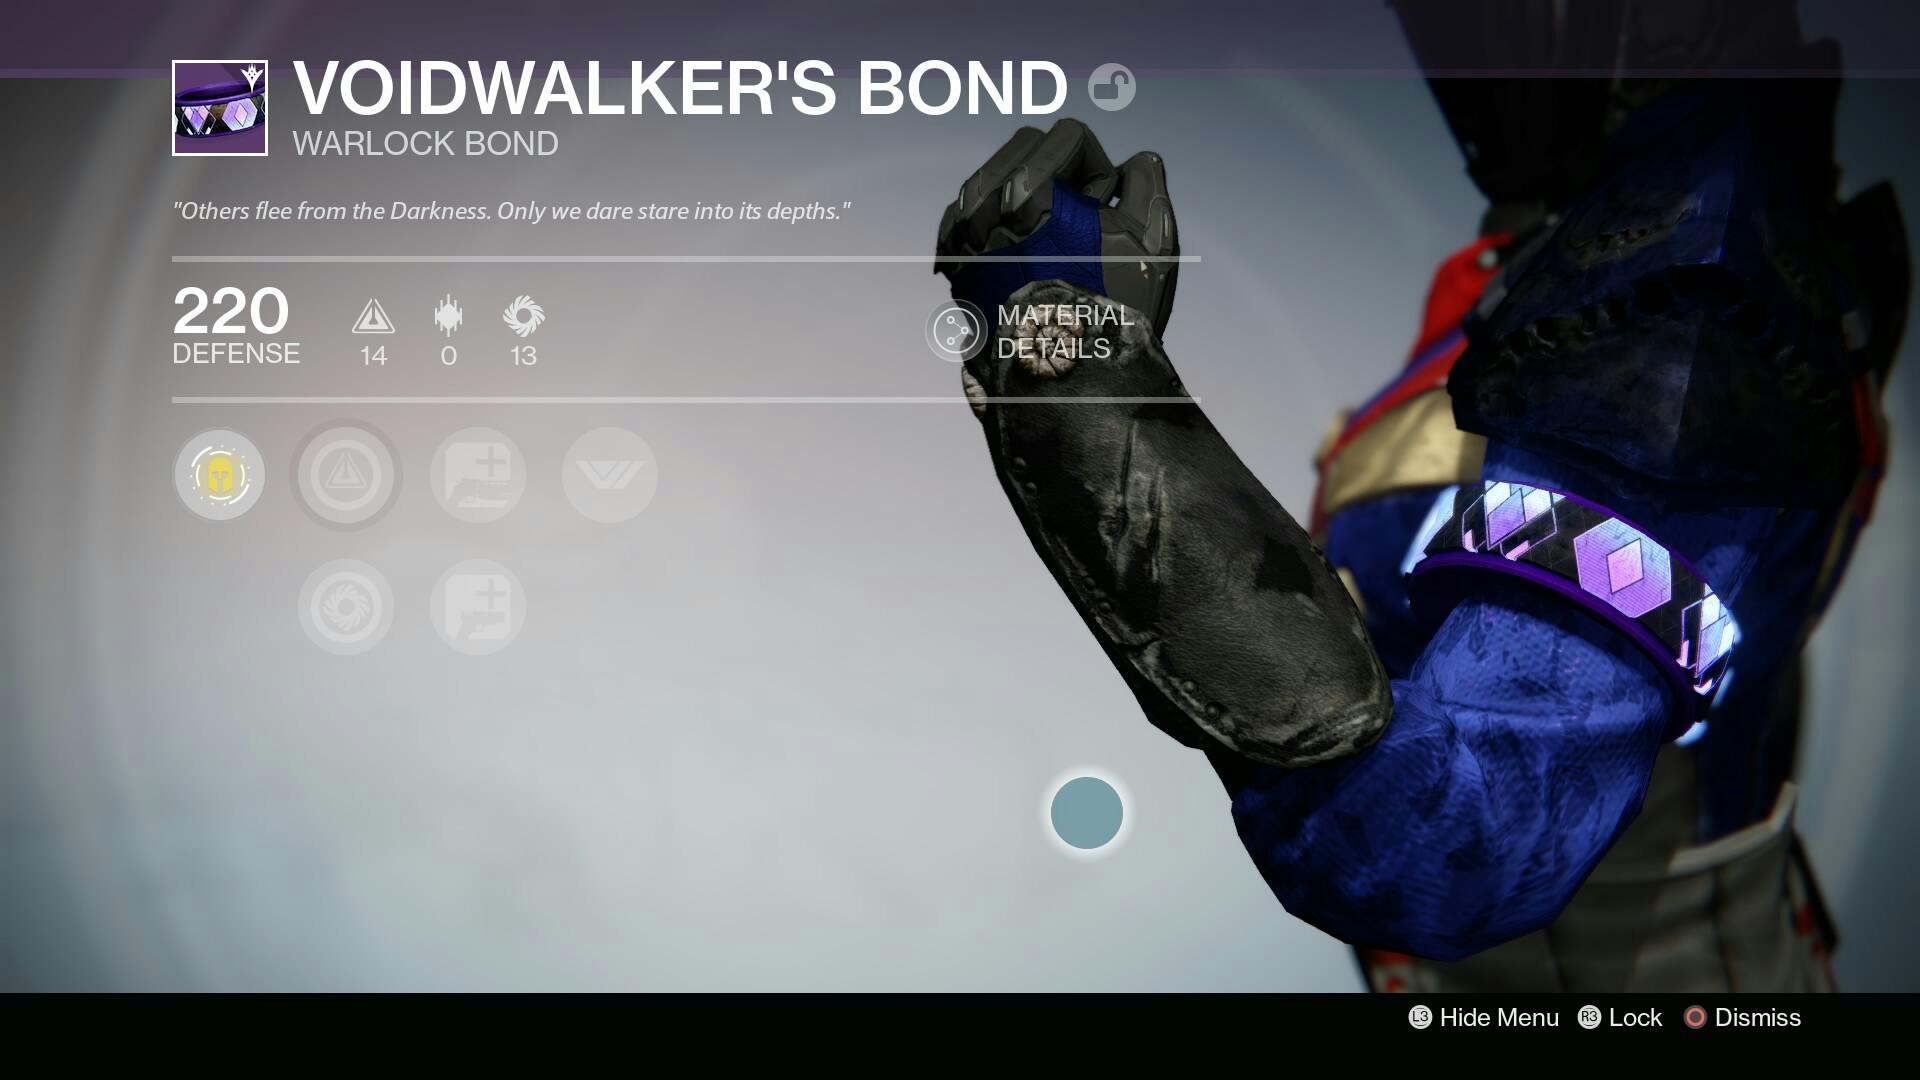 Destiny The Taken King Warlock Subclass Quests Guide